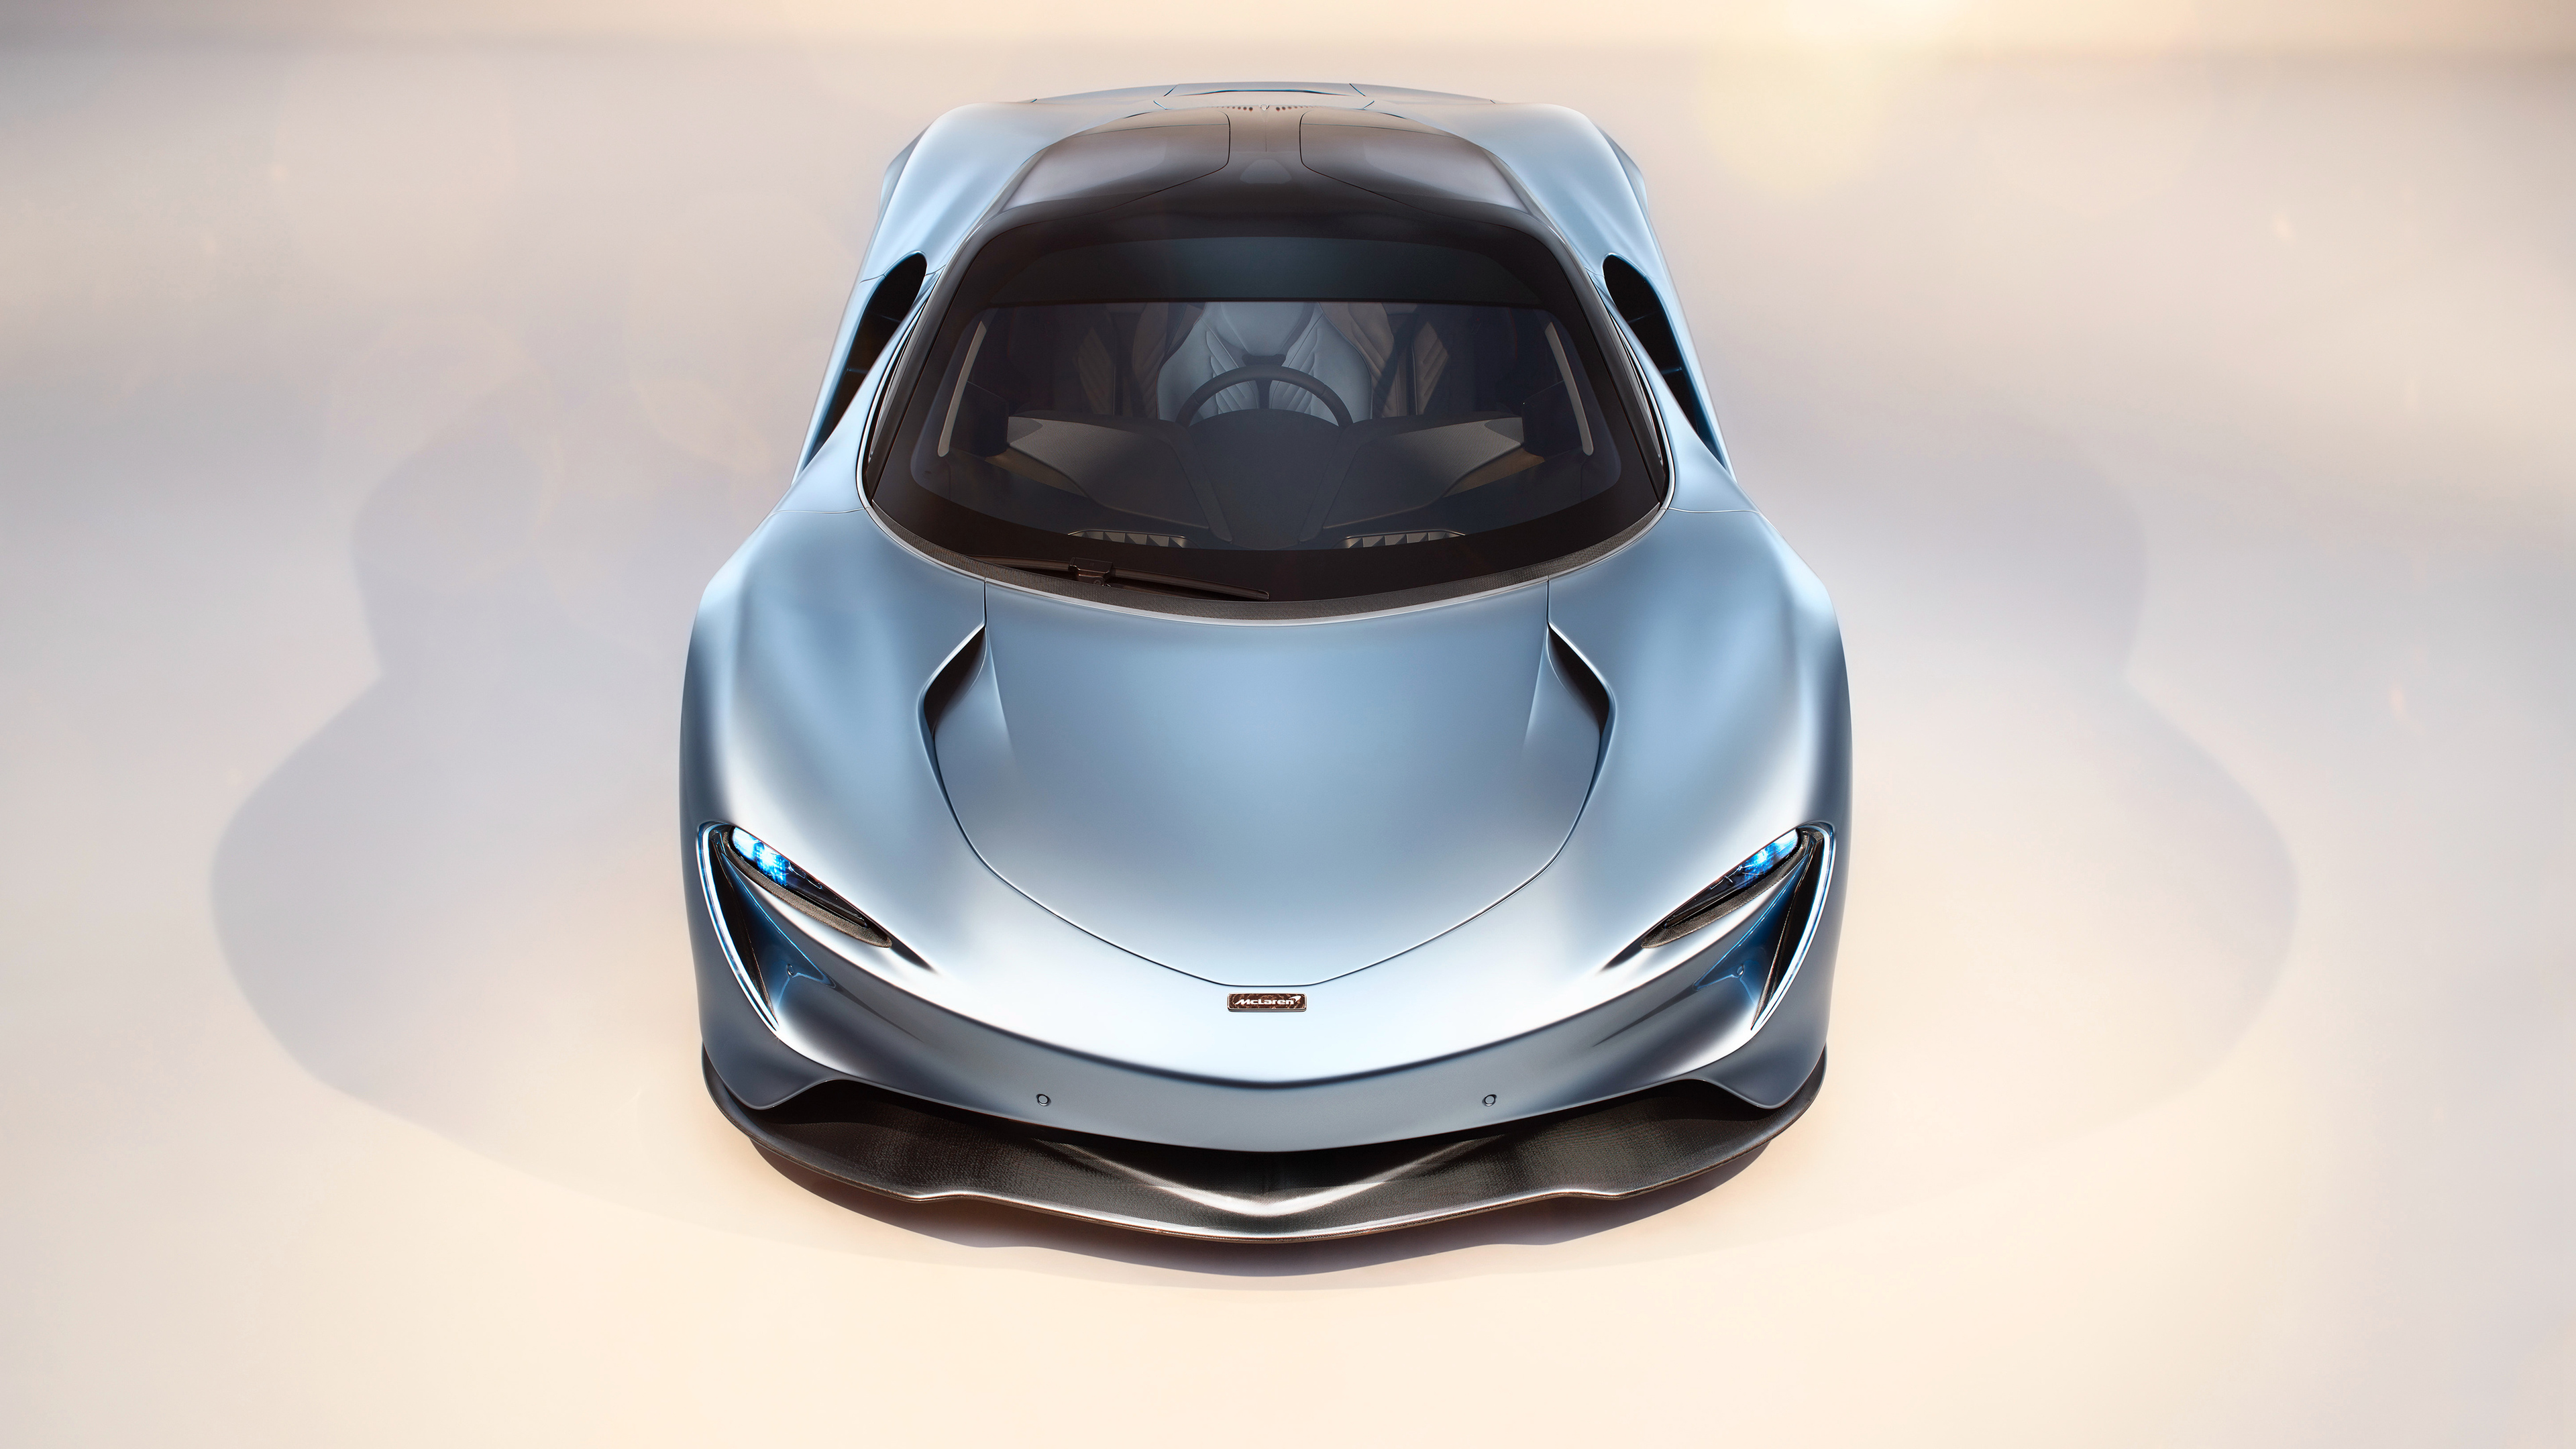 mclaren speedtail 2018 front 1541969024 - McLaren Speedtail 2018 Front - mclaren speedtail wallpapers, hd-wallpapers, cars wallpapers, 4k-wallpapers, 2018 cars wallpapers